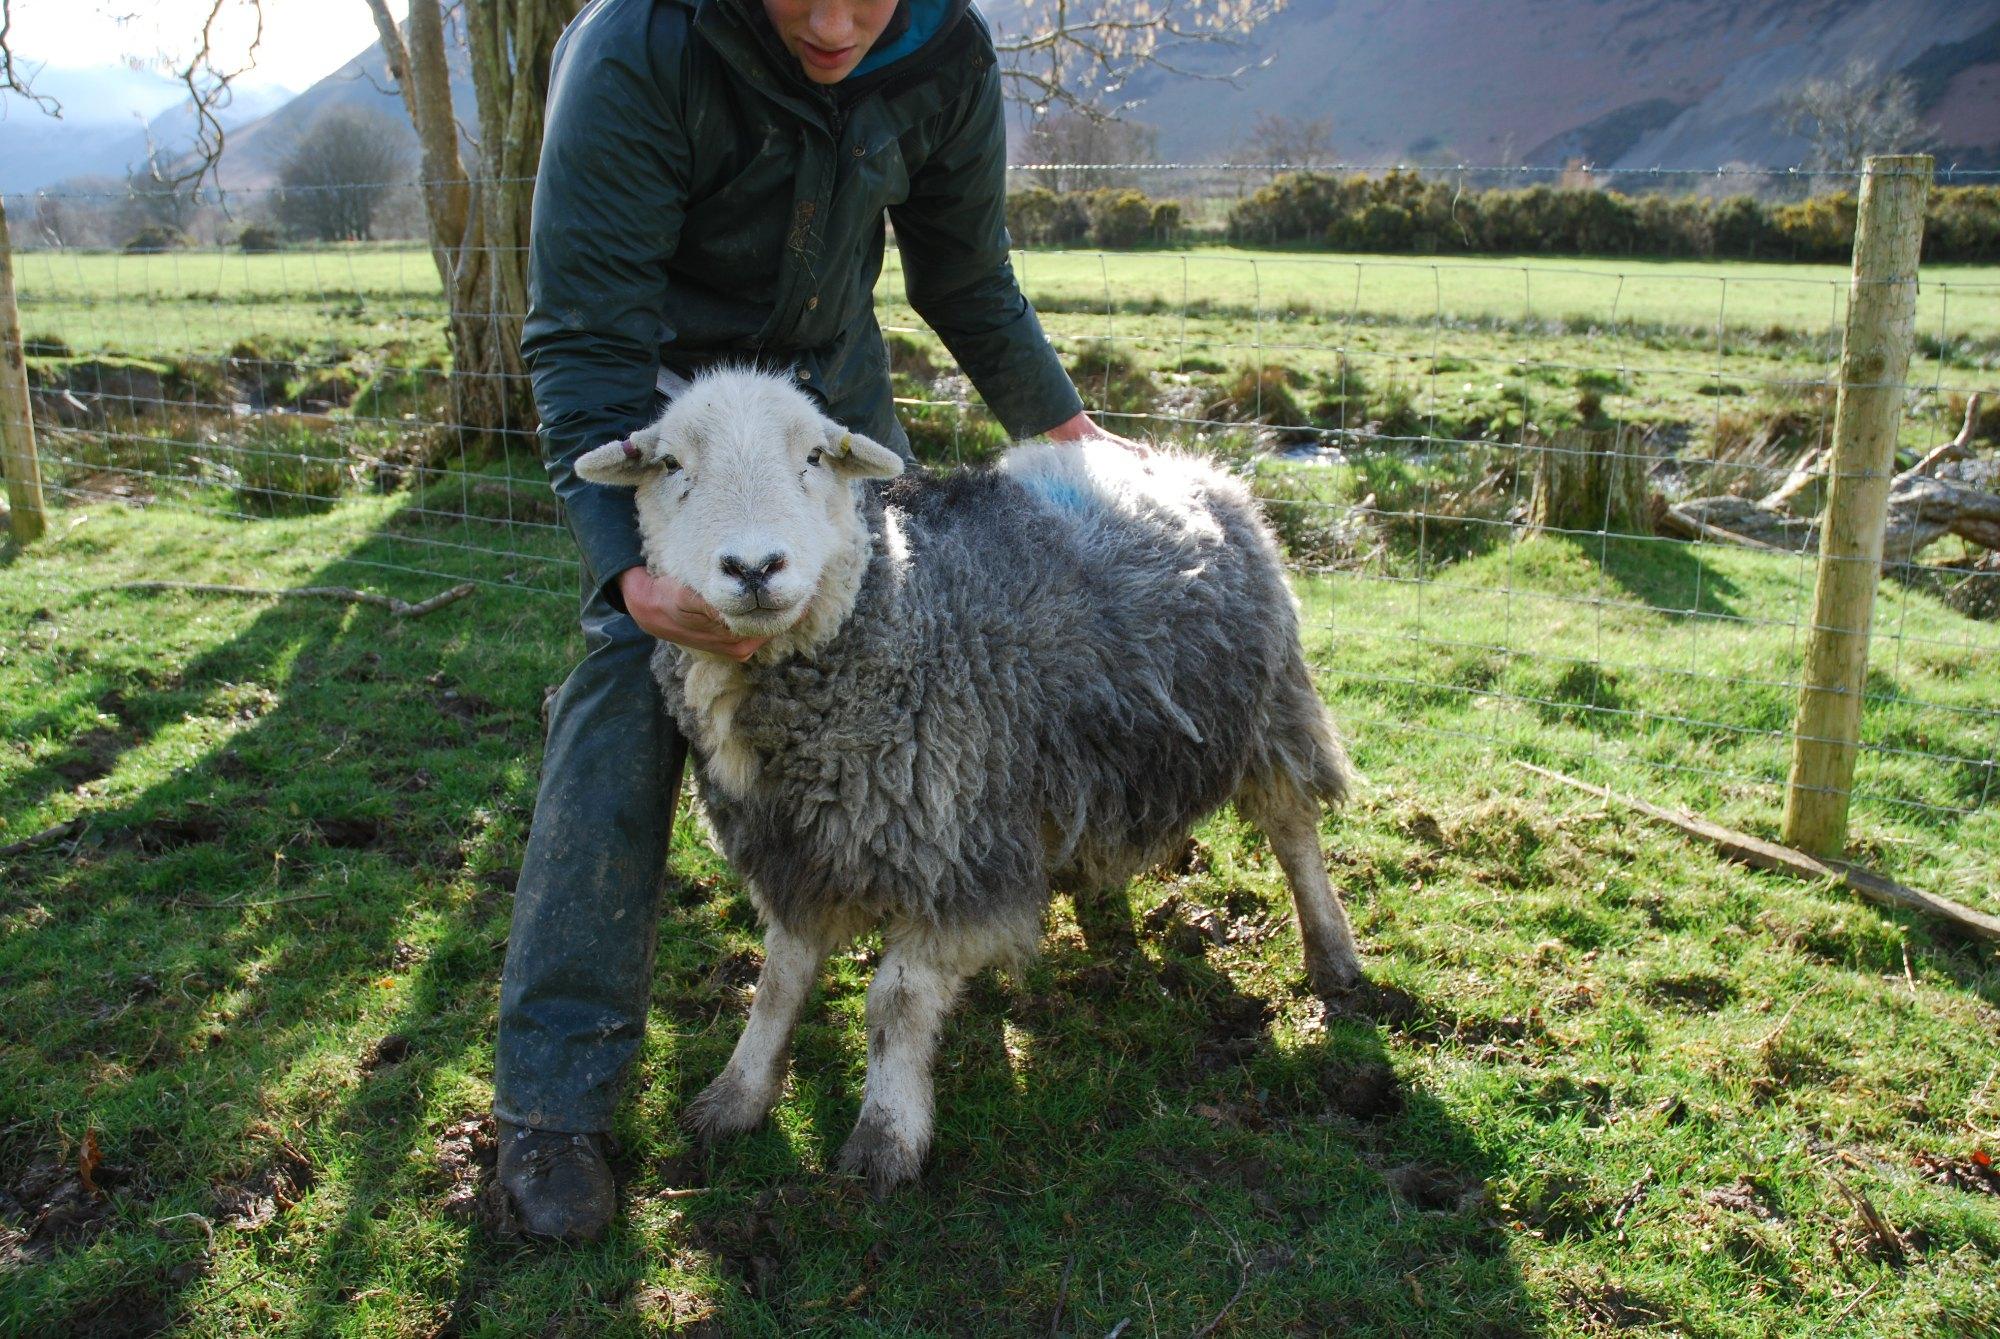 Craig introducing me to a Herdwick Sheep